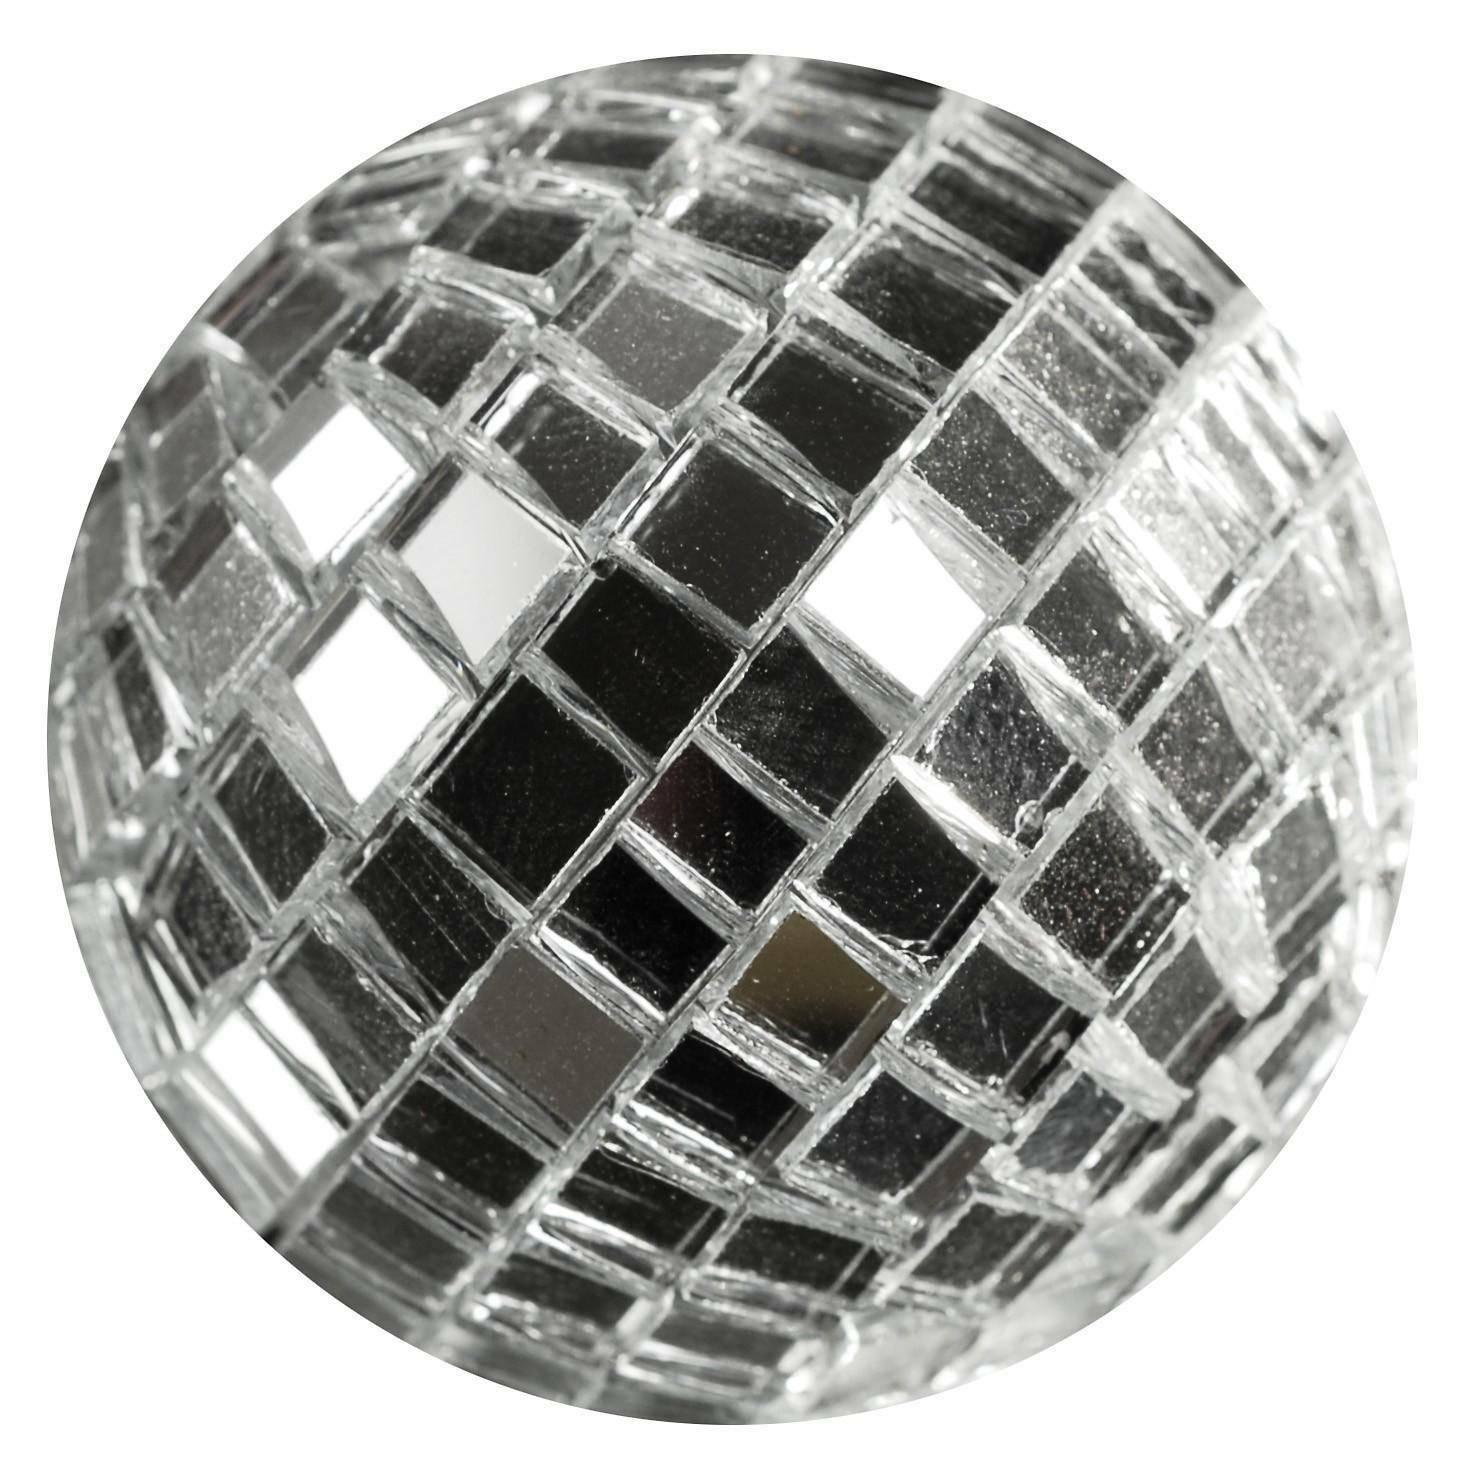 eurosand eurosand sfere di specchio argento 20mm (30pz)